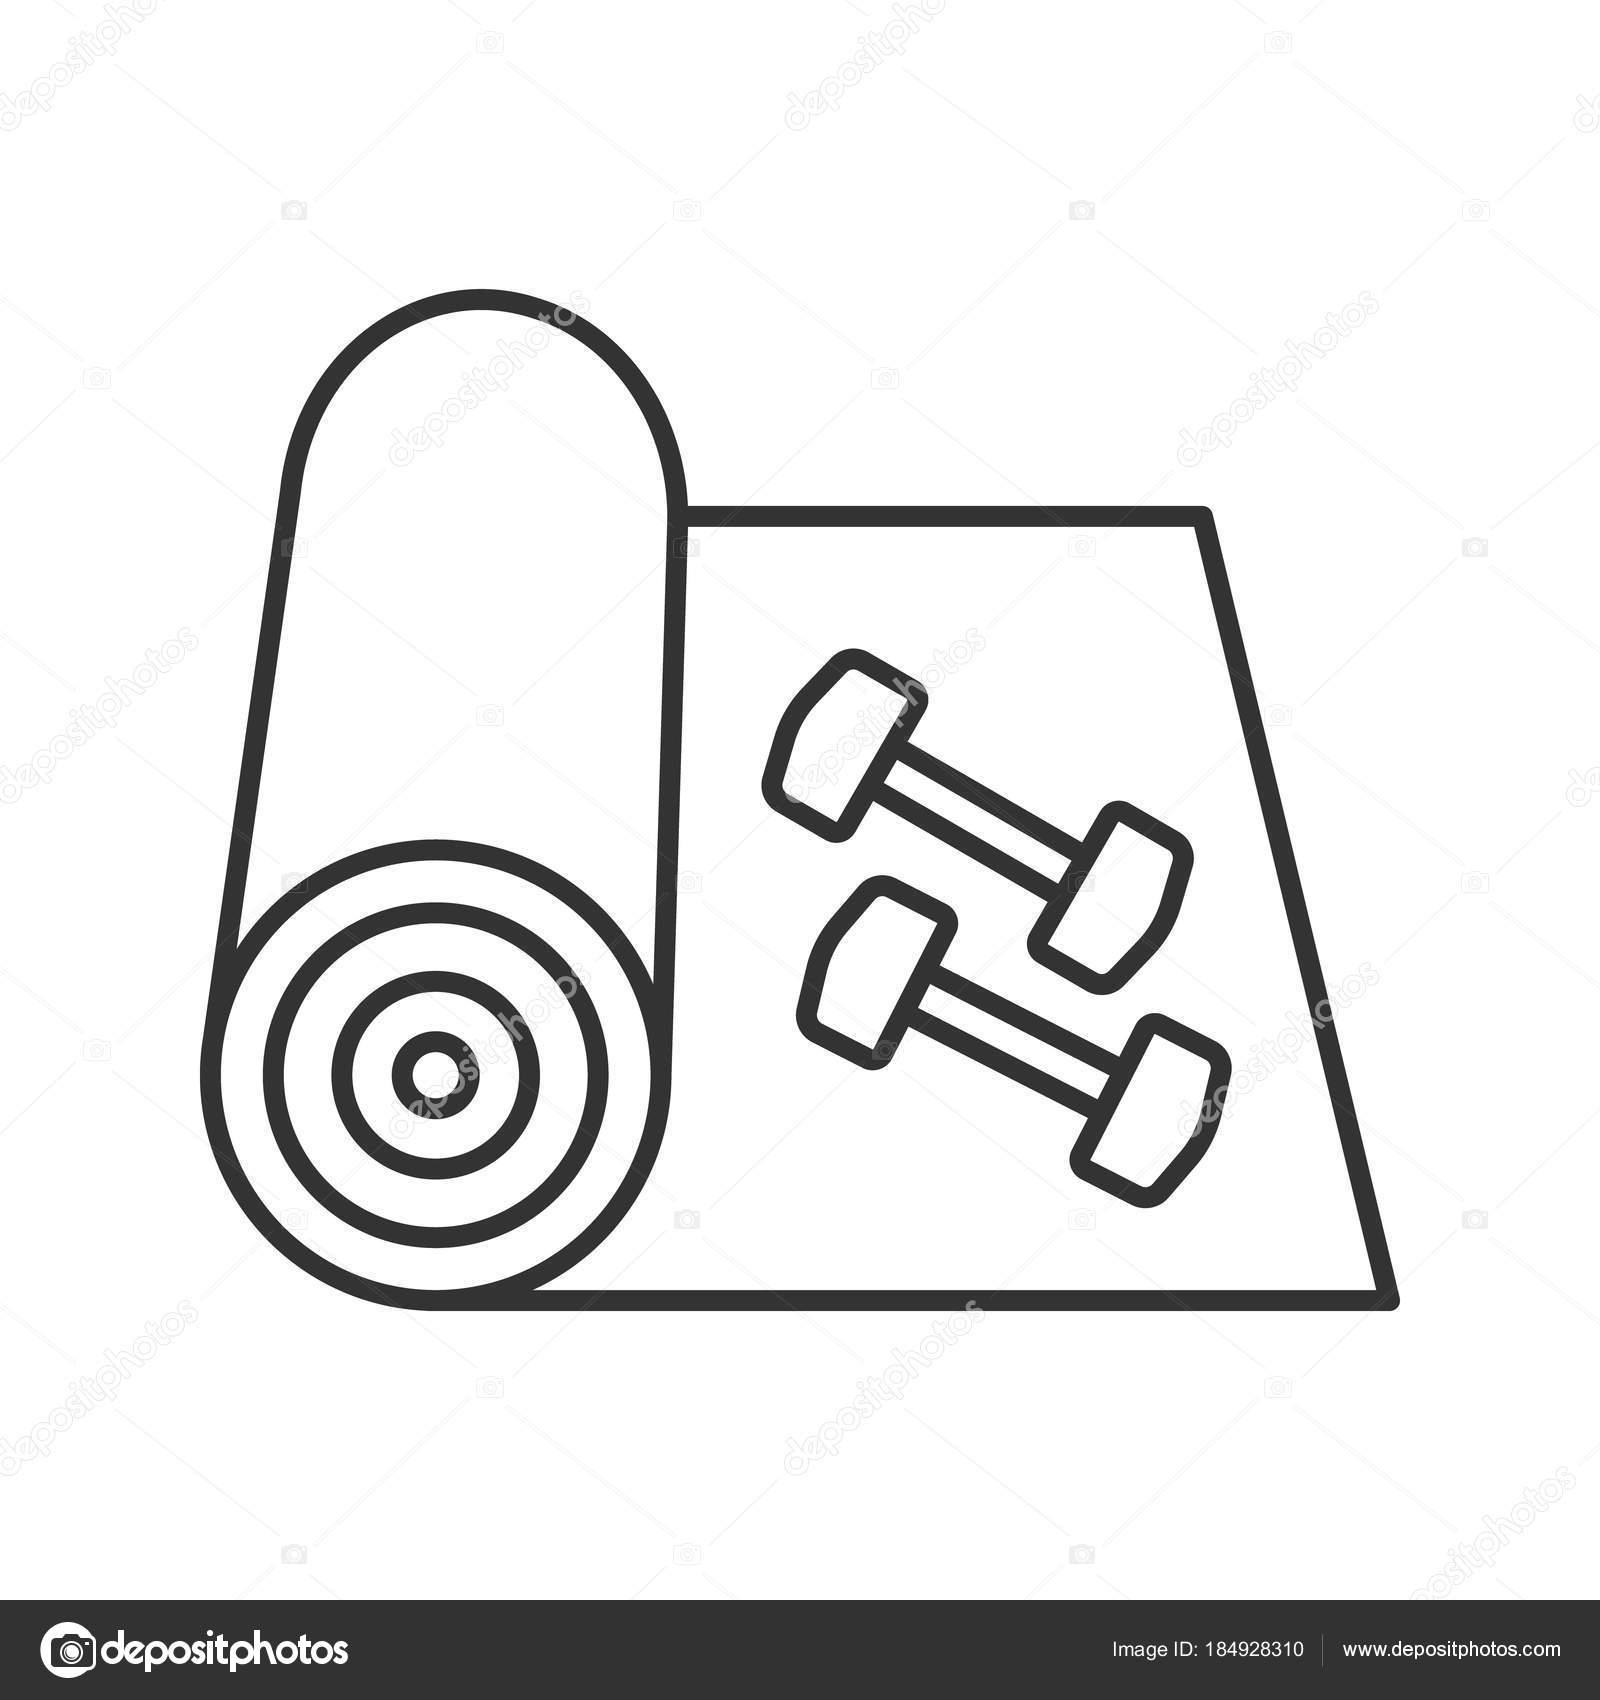 Training Mat Dumbbells Linear Icon Thin Line Illustration Yoga Carpet Stock Vector